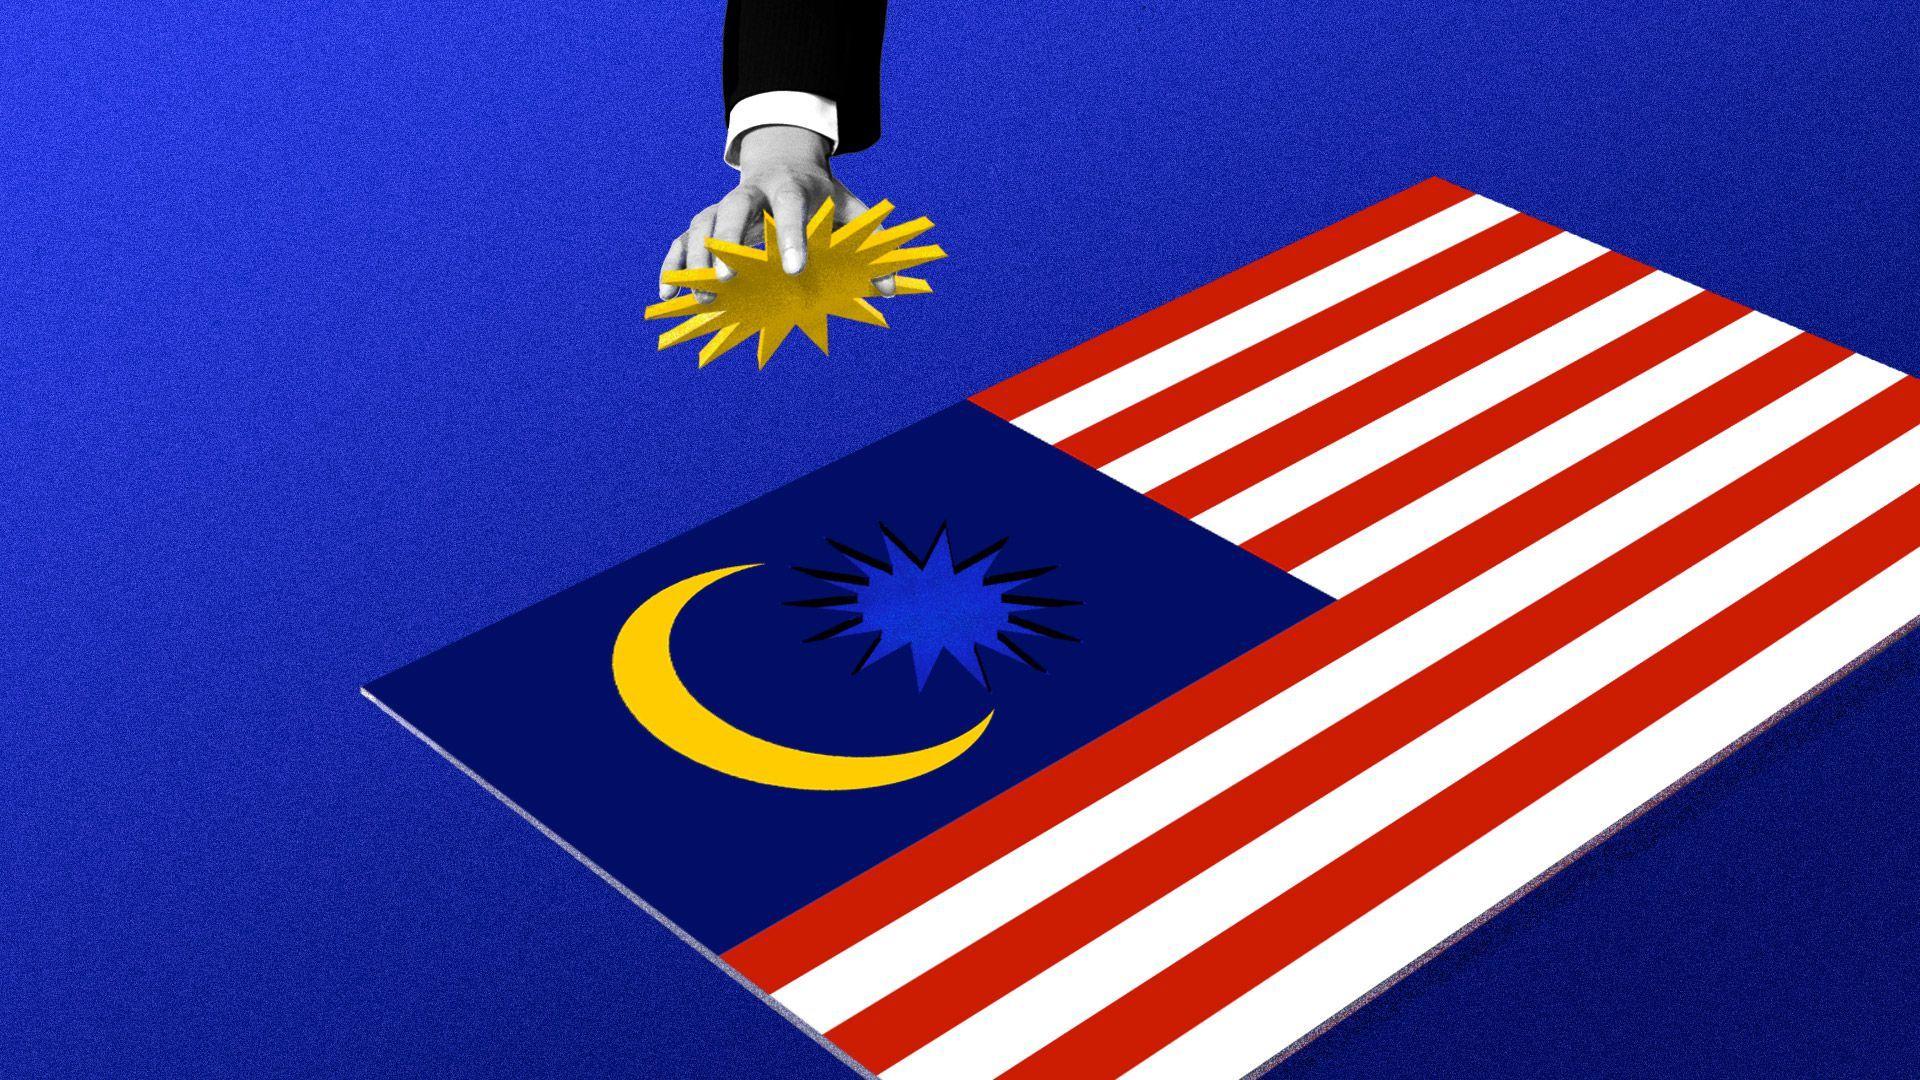 Stealing Malaysia's patrimony